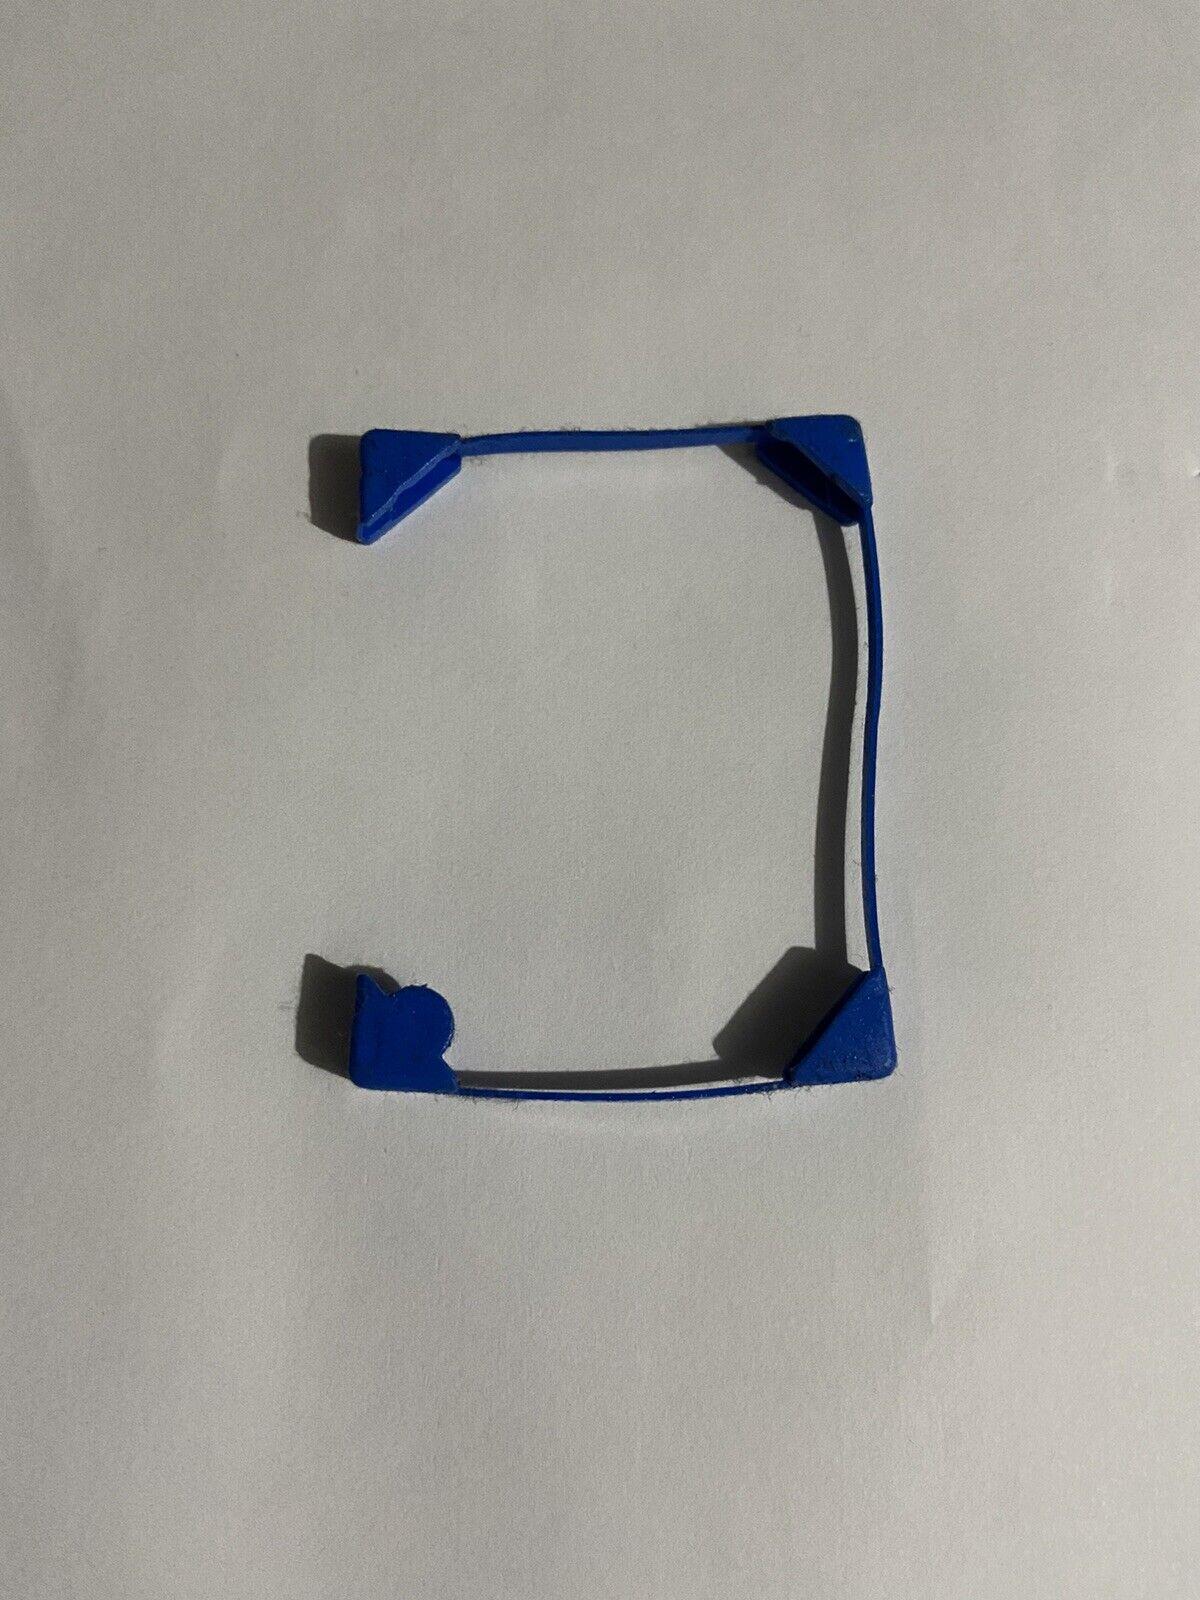 Blue Rubber Hard Drive HDD Caddy Holder HP COMPAQ 2510p Laptop HDD